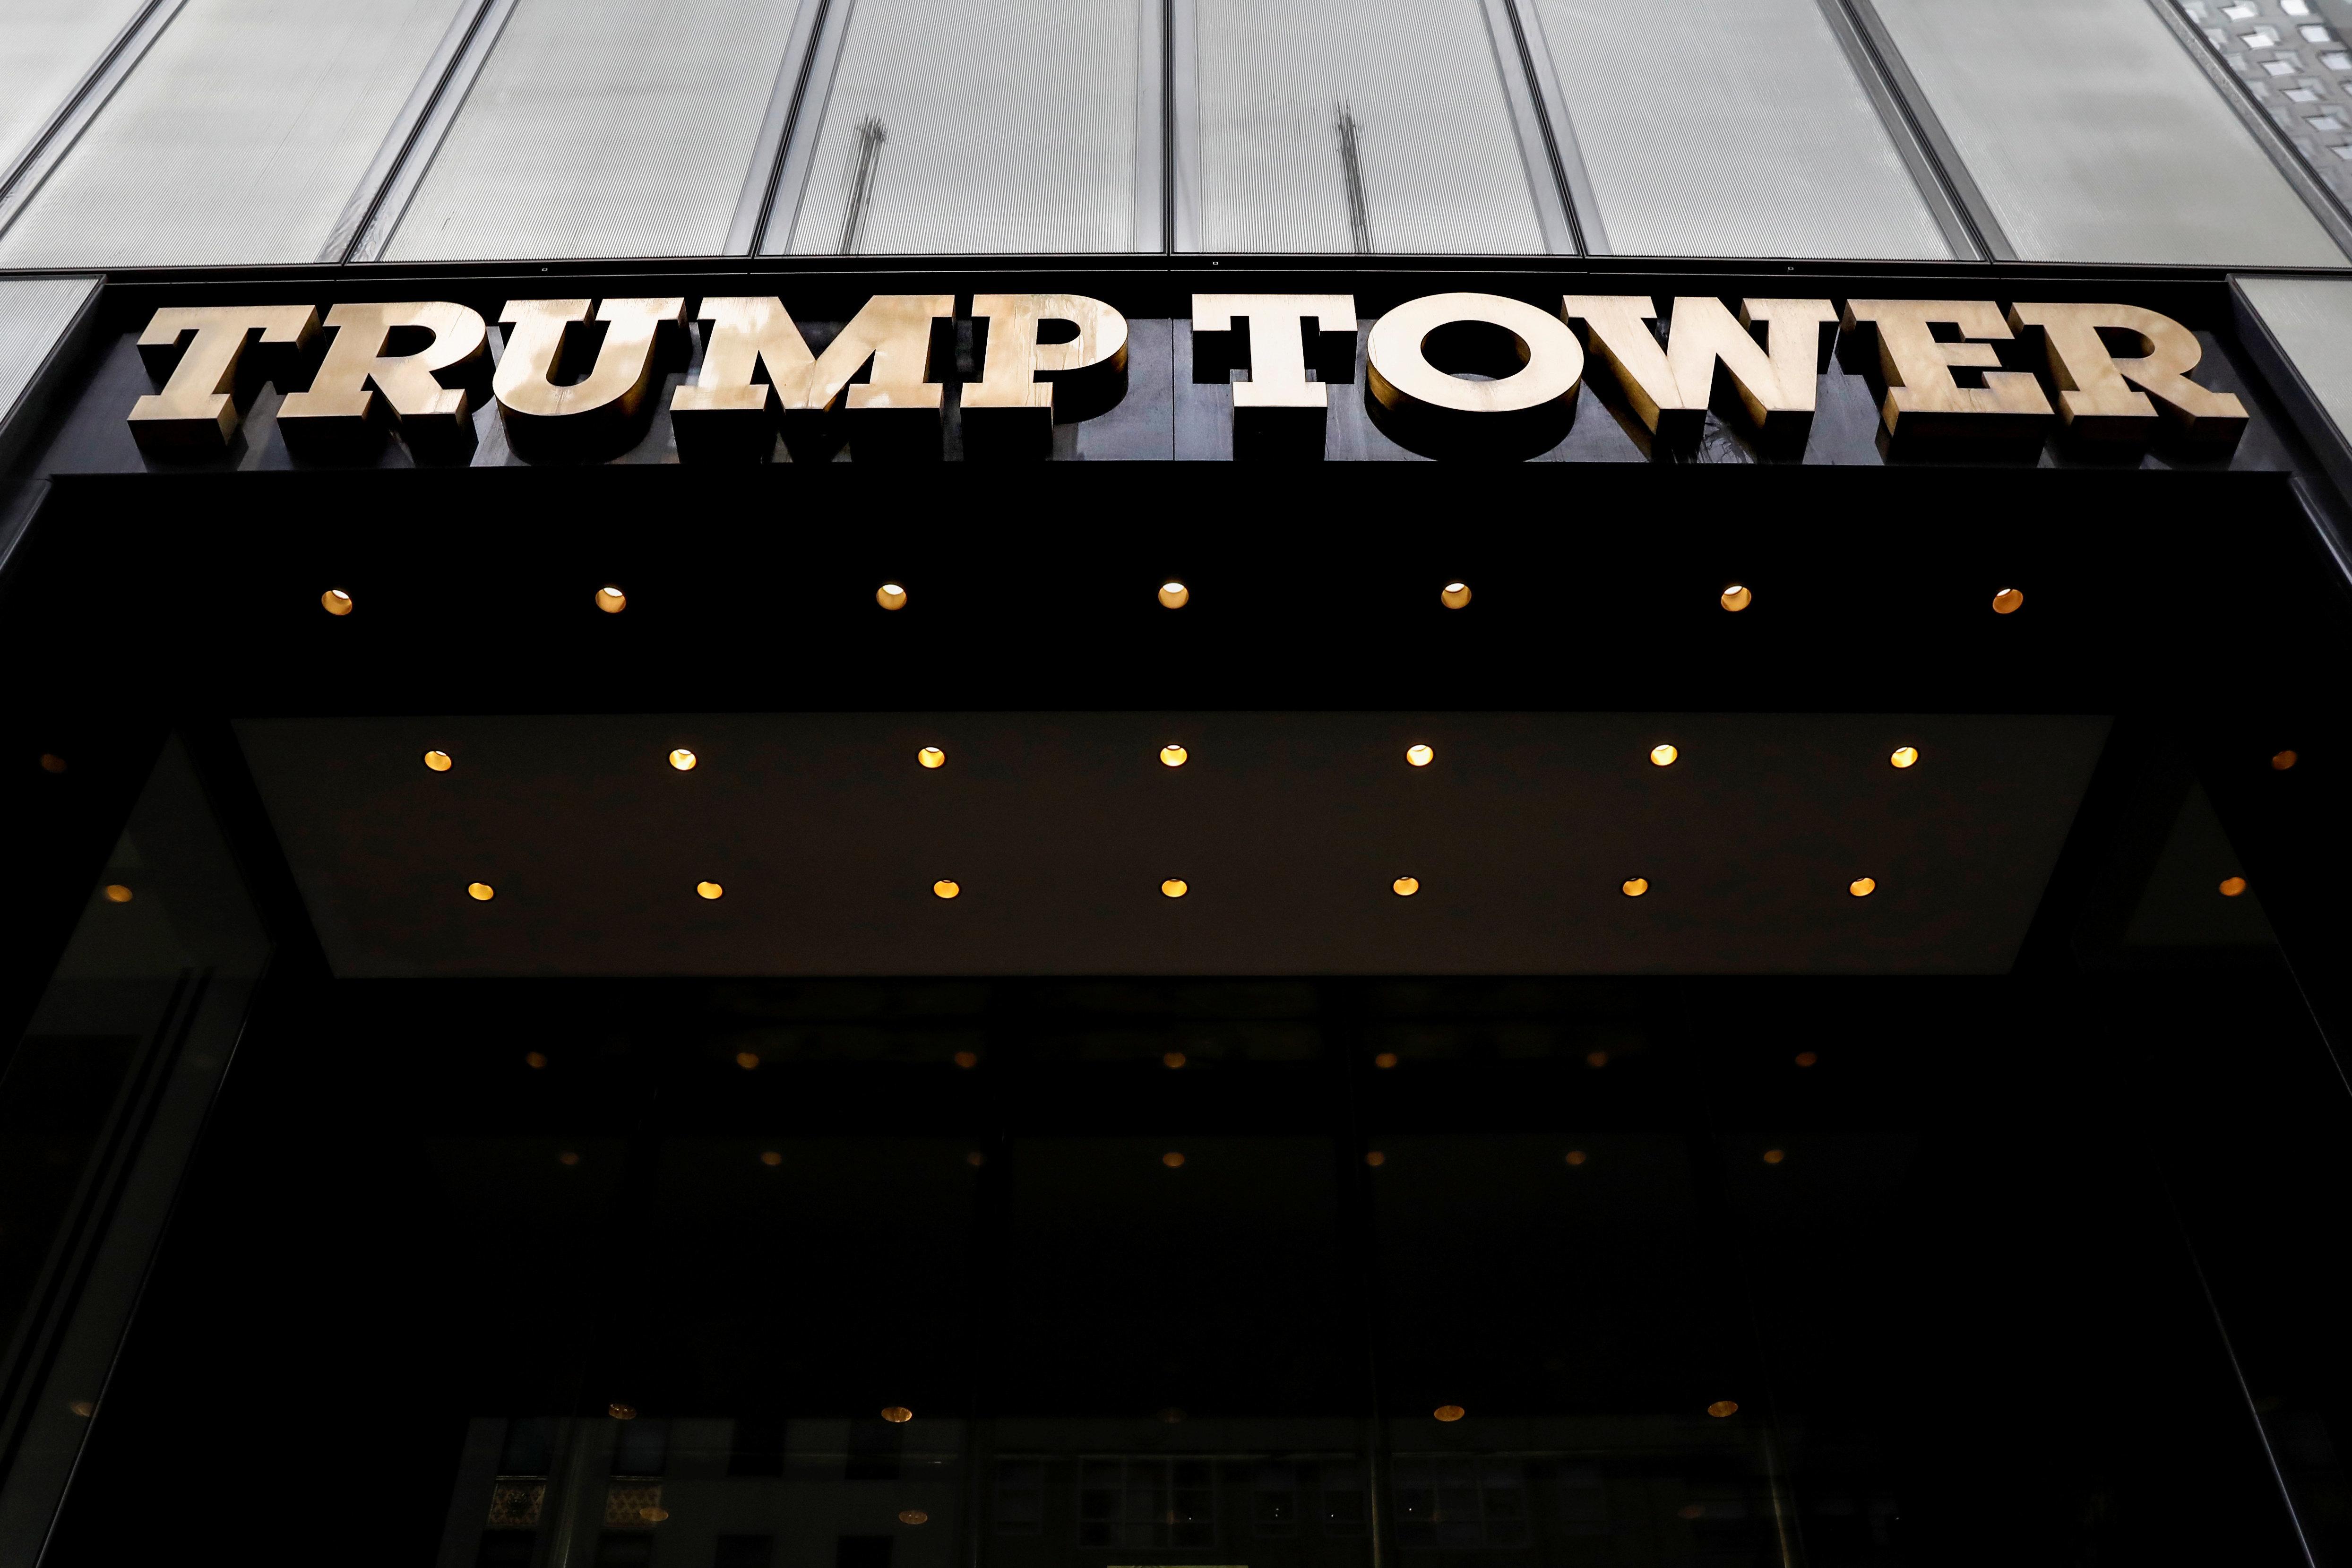 Trump Tower on 5th Avenue is seen in New York City, U.S., April 10, 2018. REUTERS/Brendan McDermid